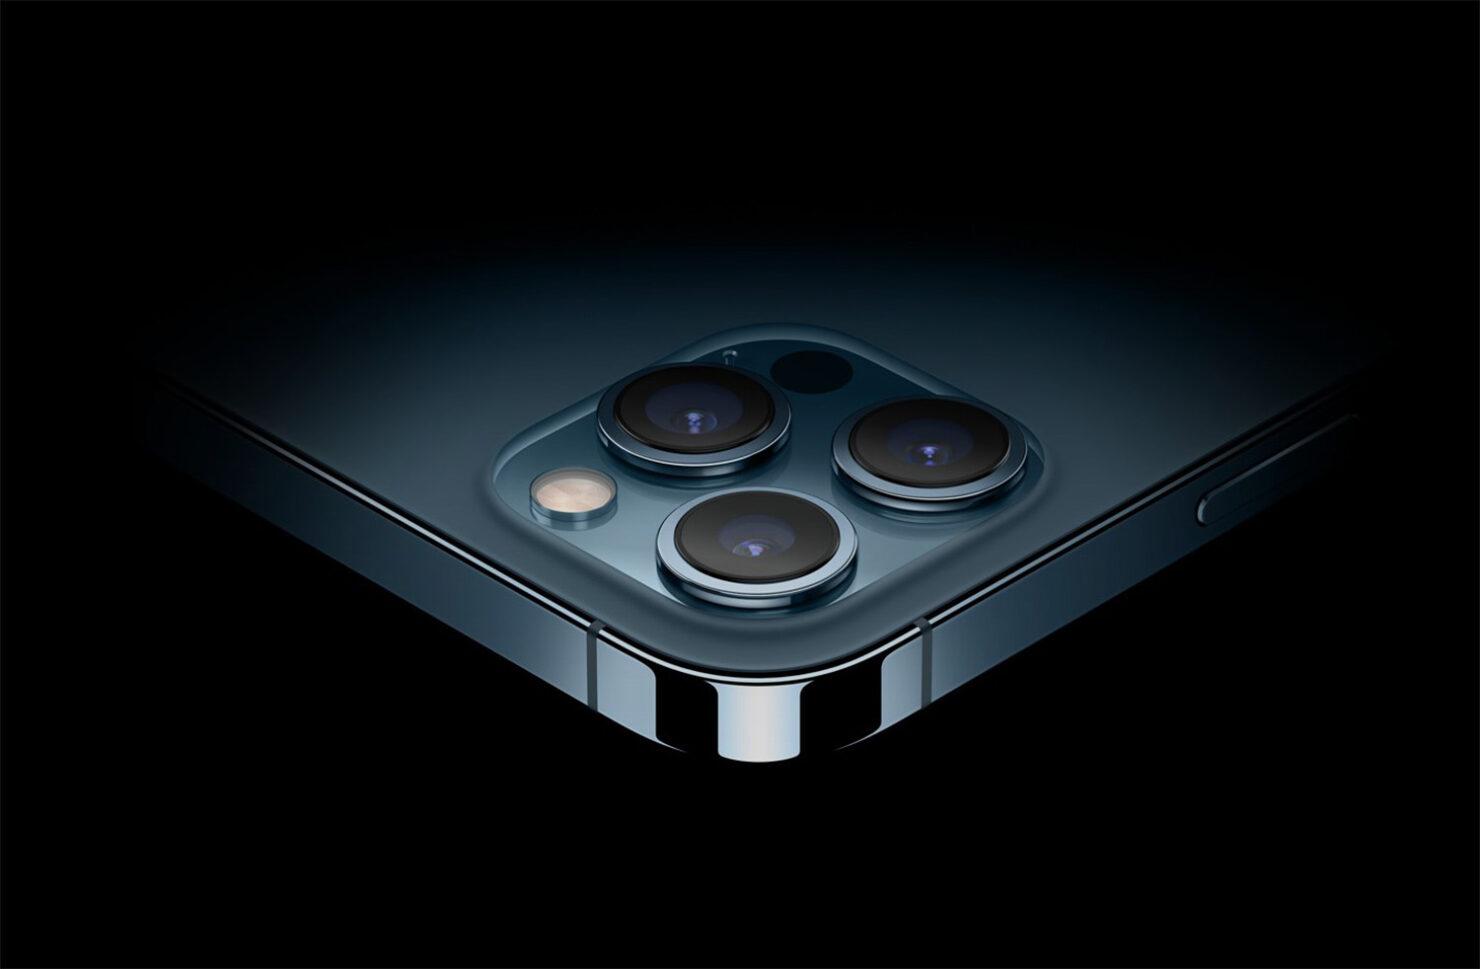 Apple iPhone Periscope Folded Lens 2023